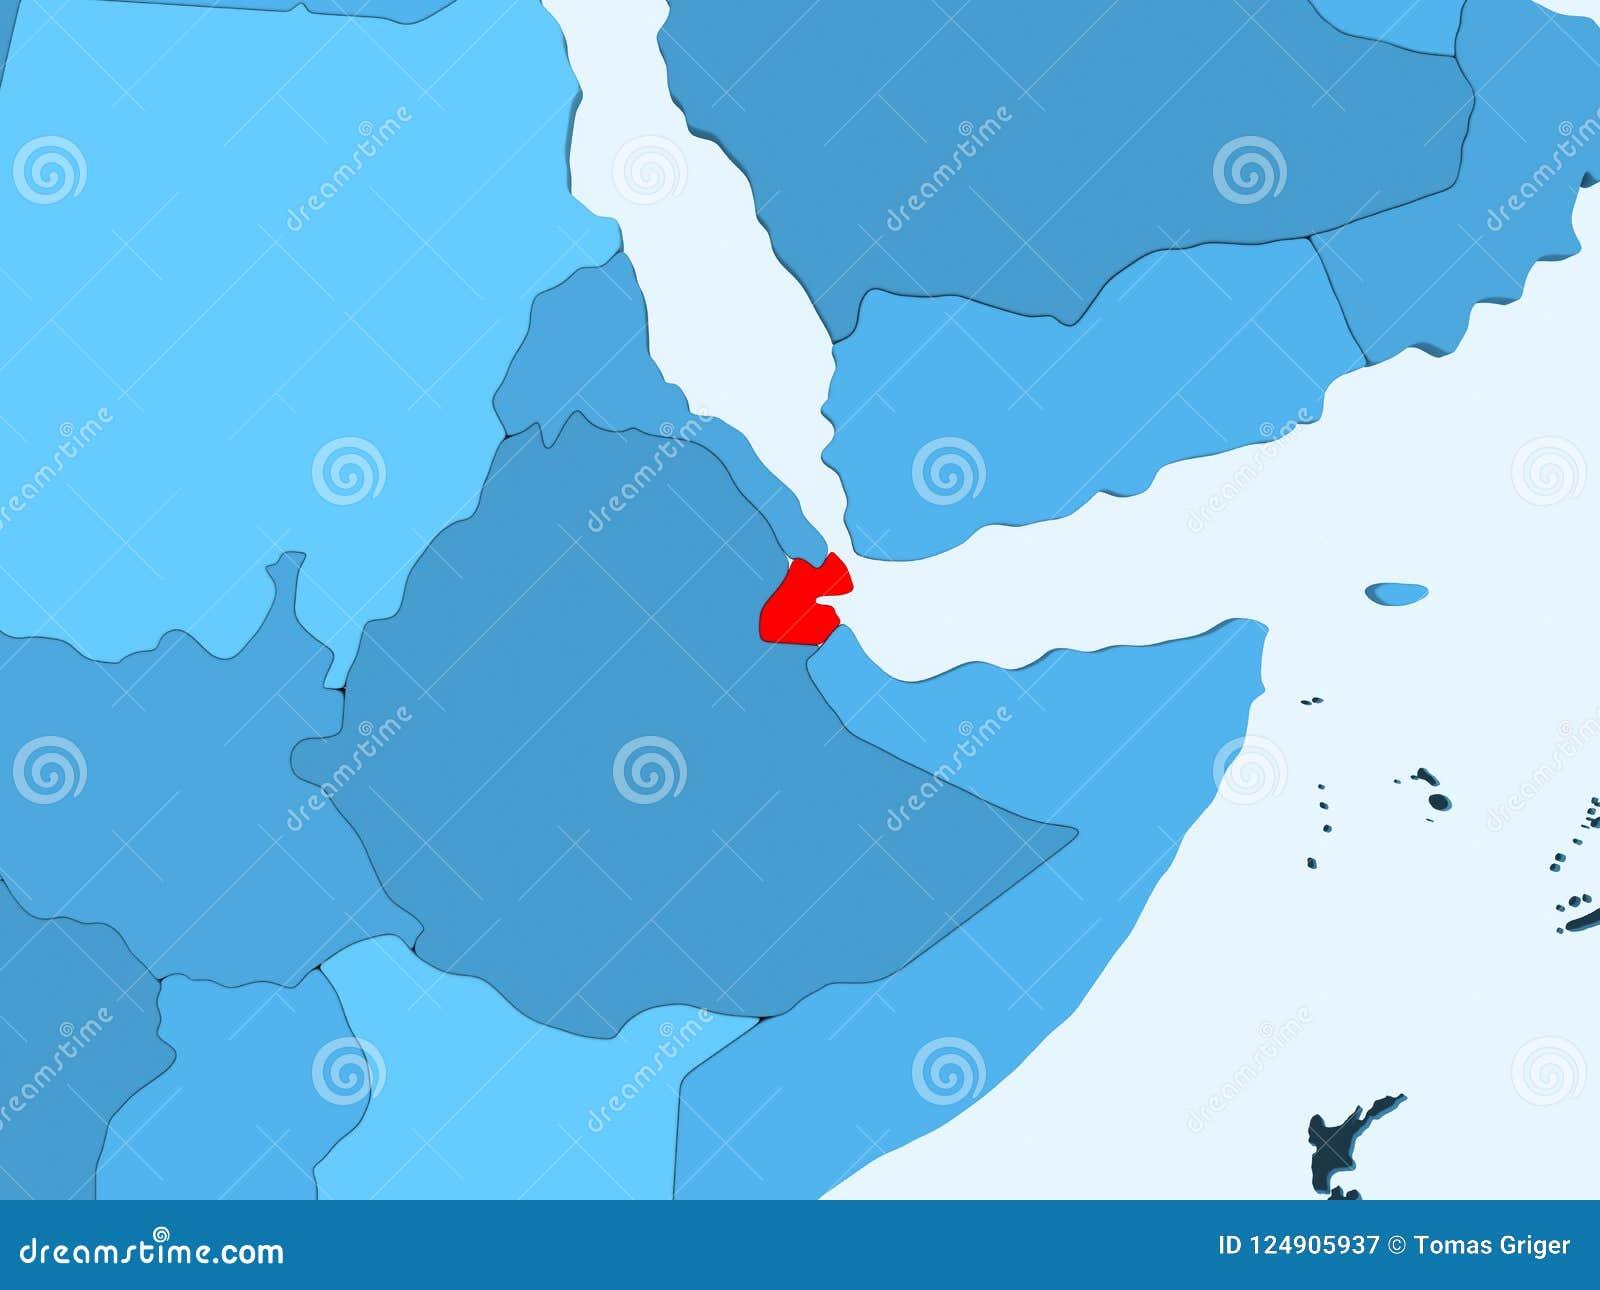 Map of Djibouti stock illustration. Illustration of translucent ...